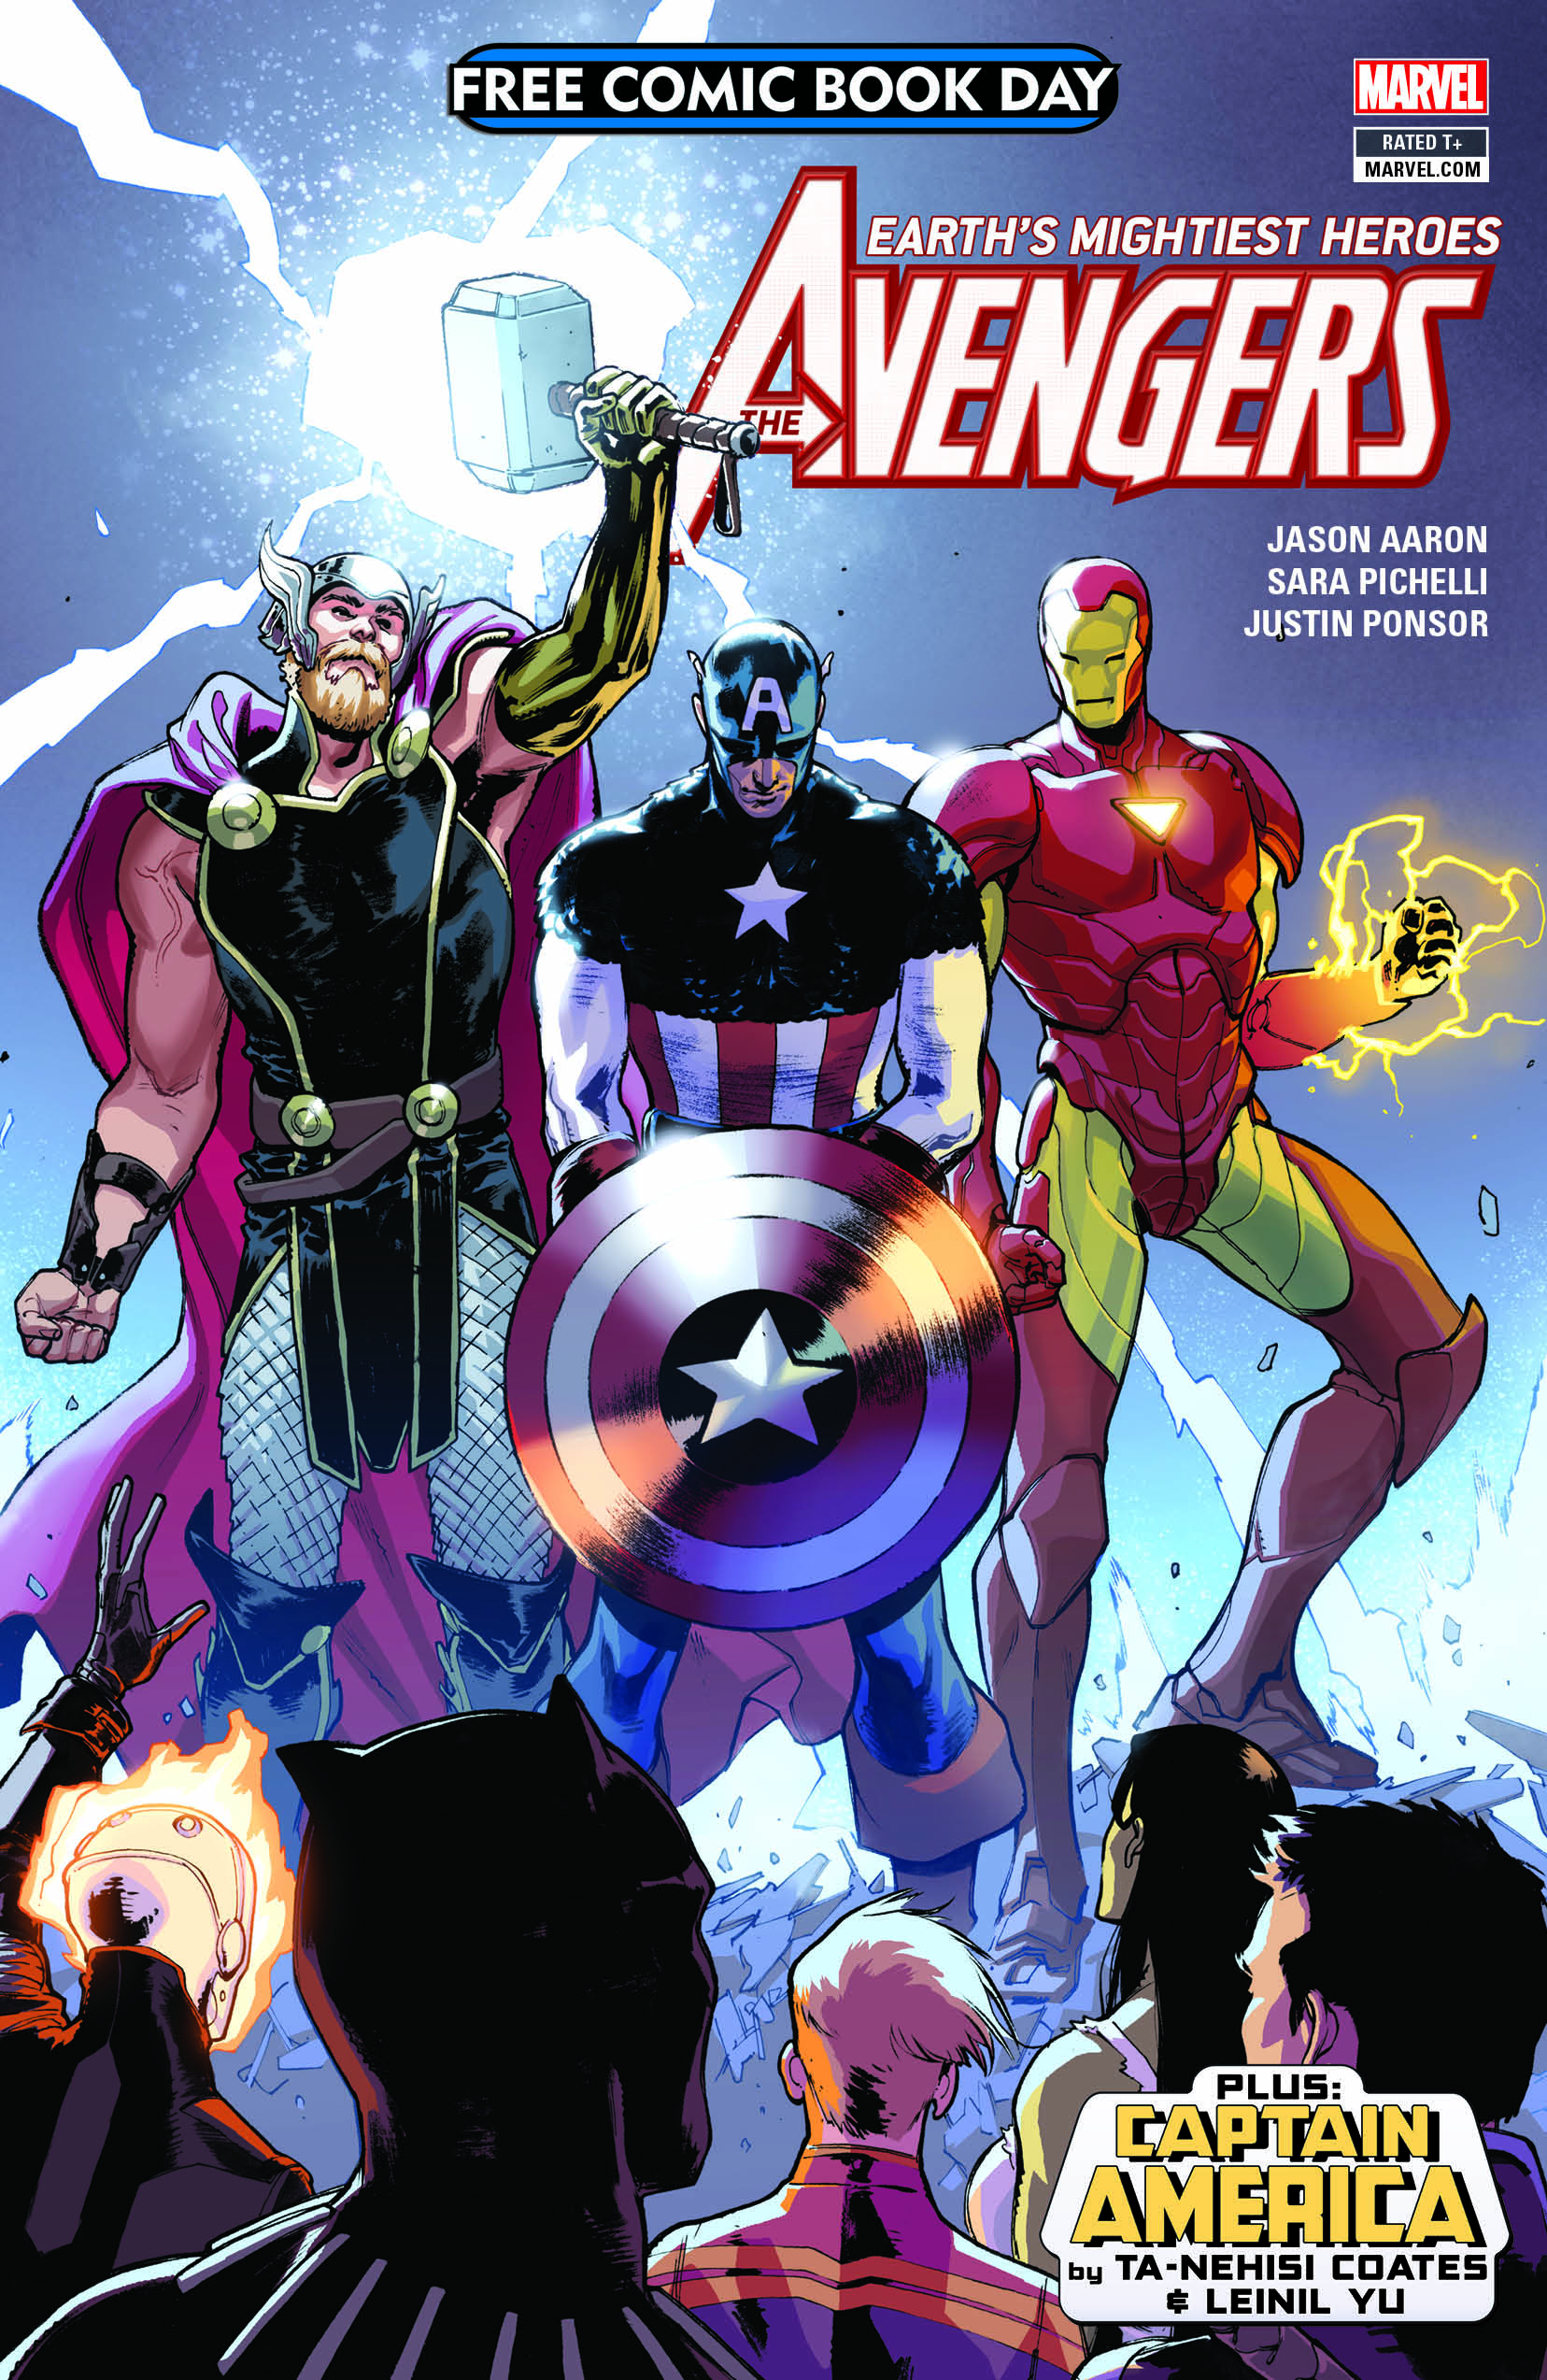 Free Comic Book Day Avengers #1